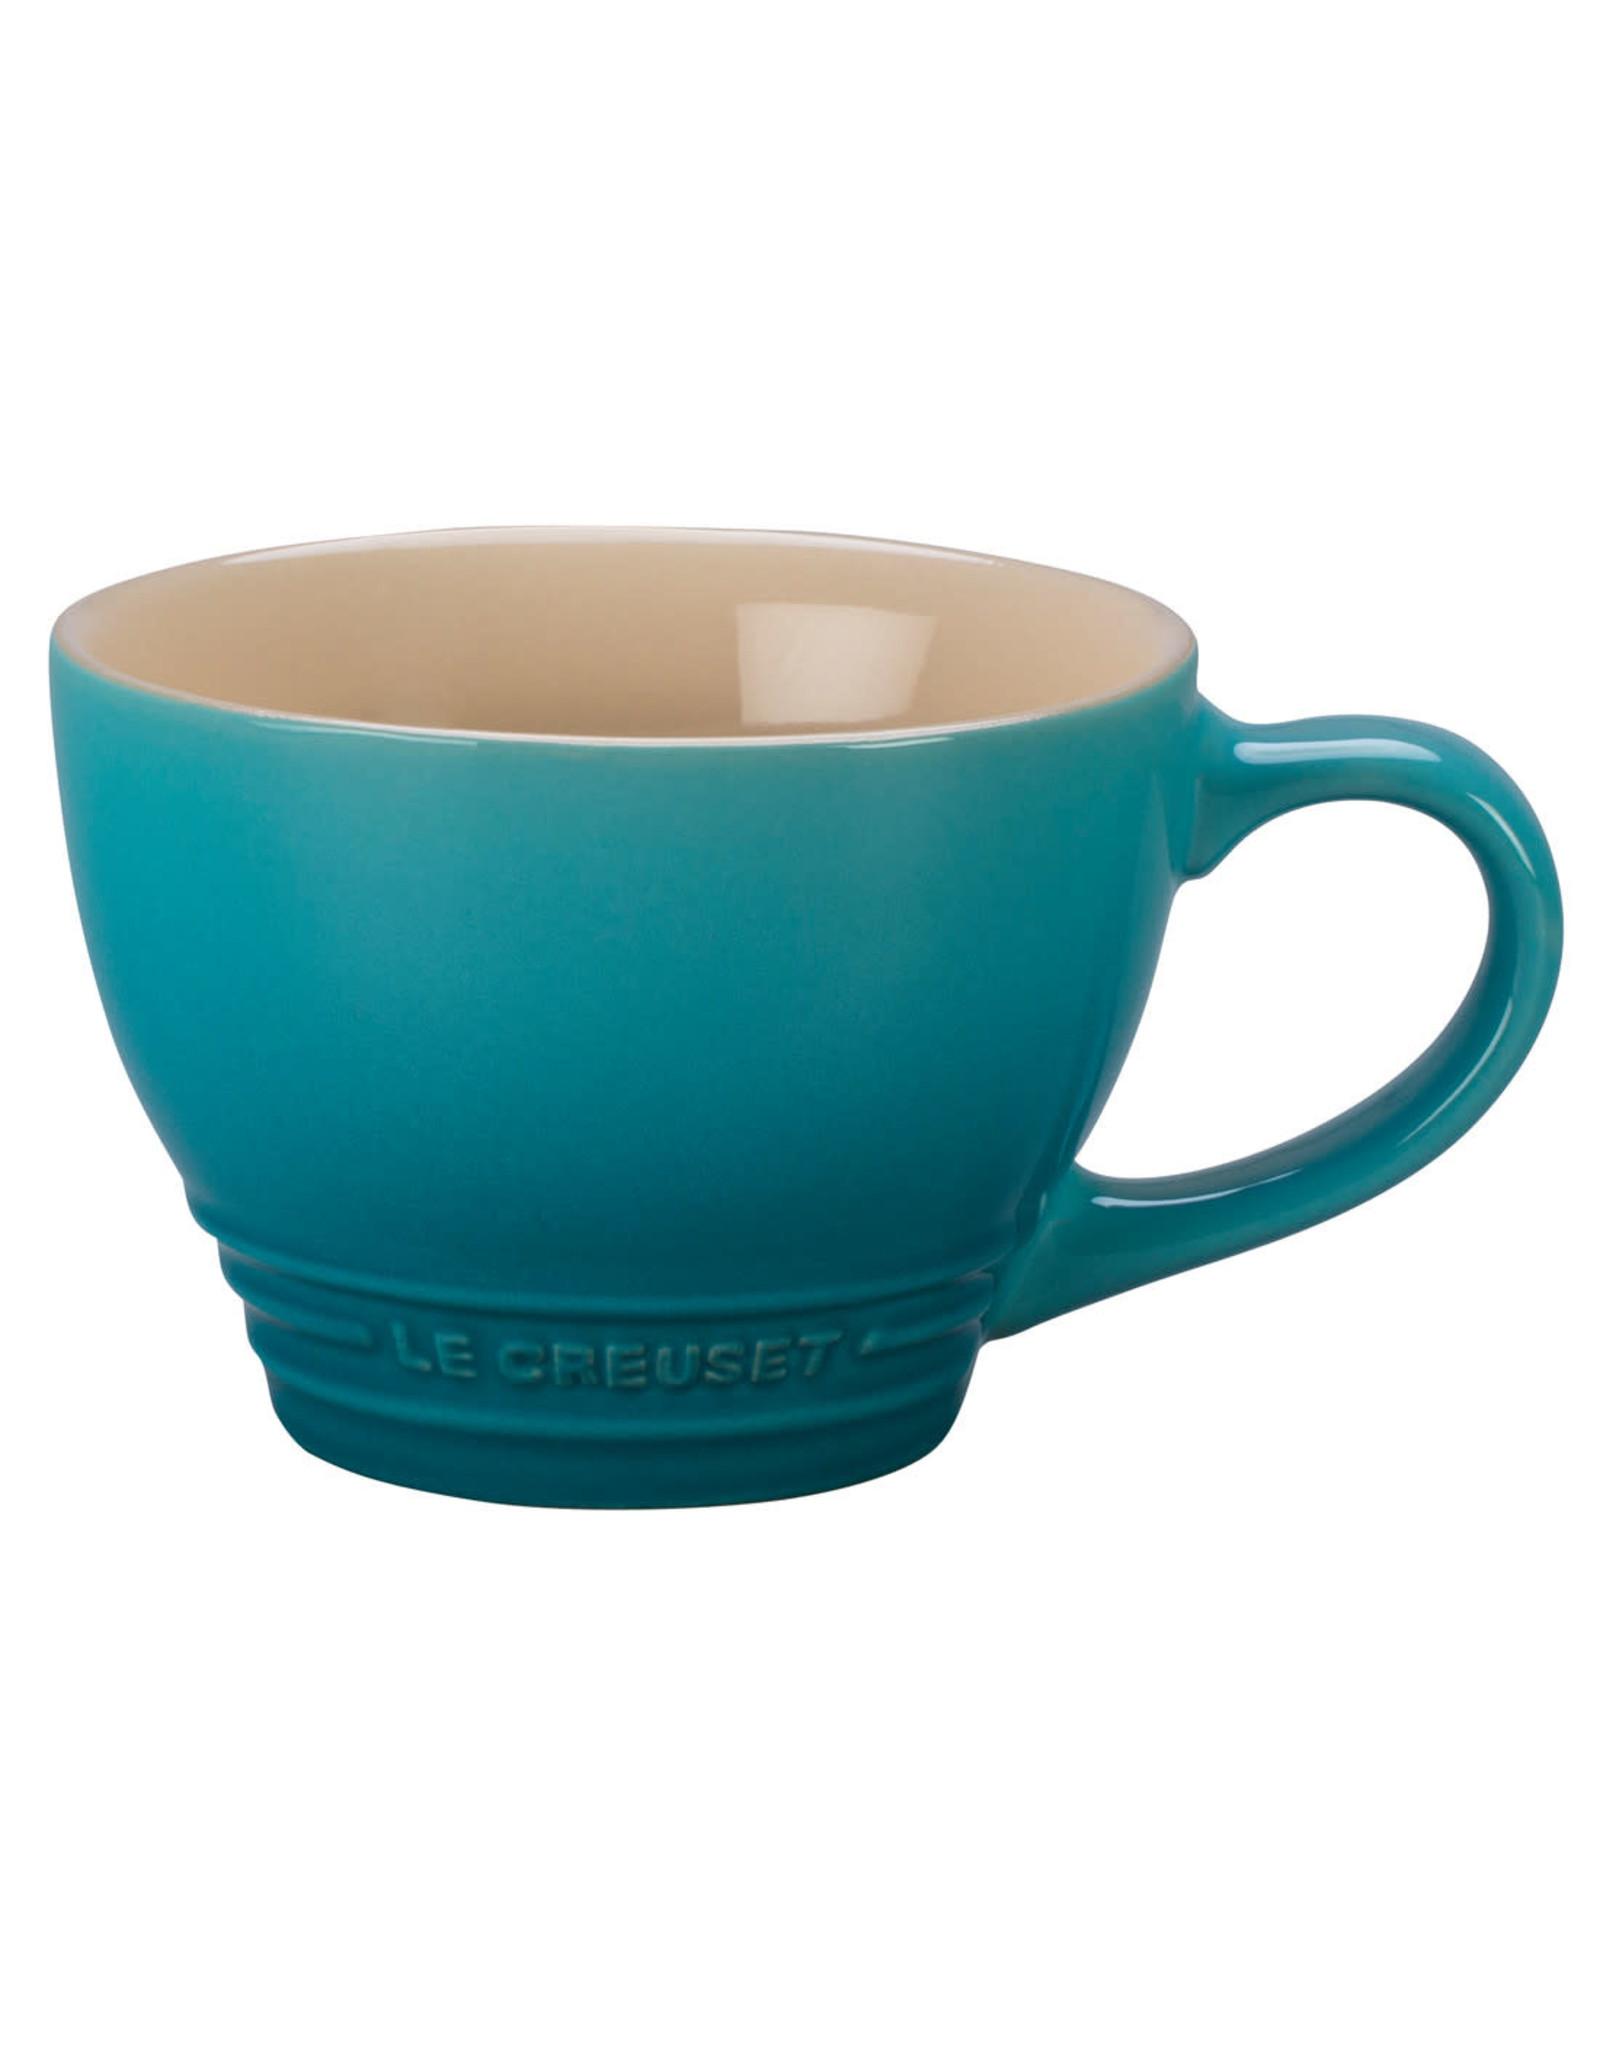 Le Creuset Le Creuset Bistro Mug Caribbean